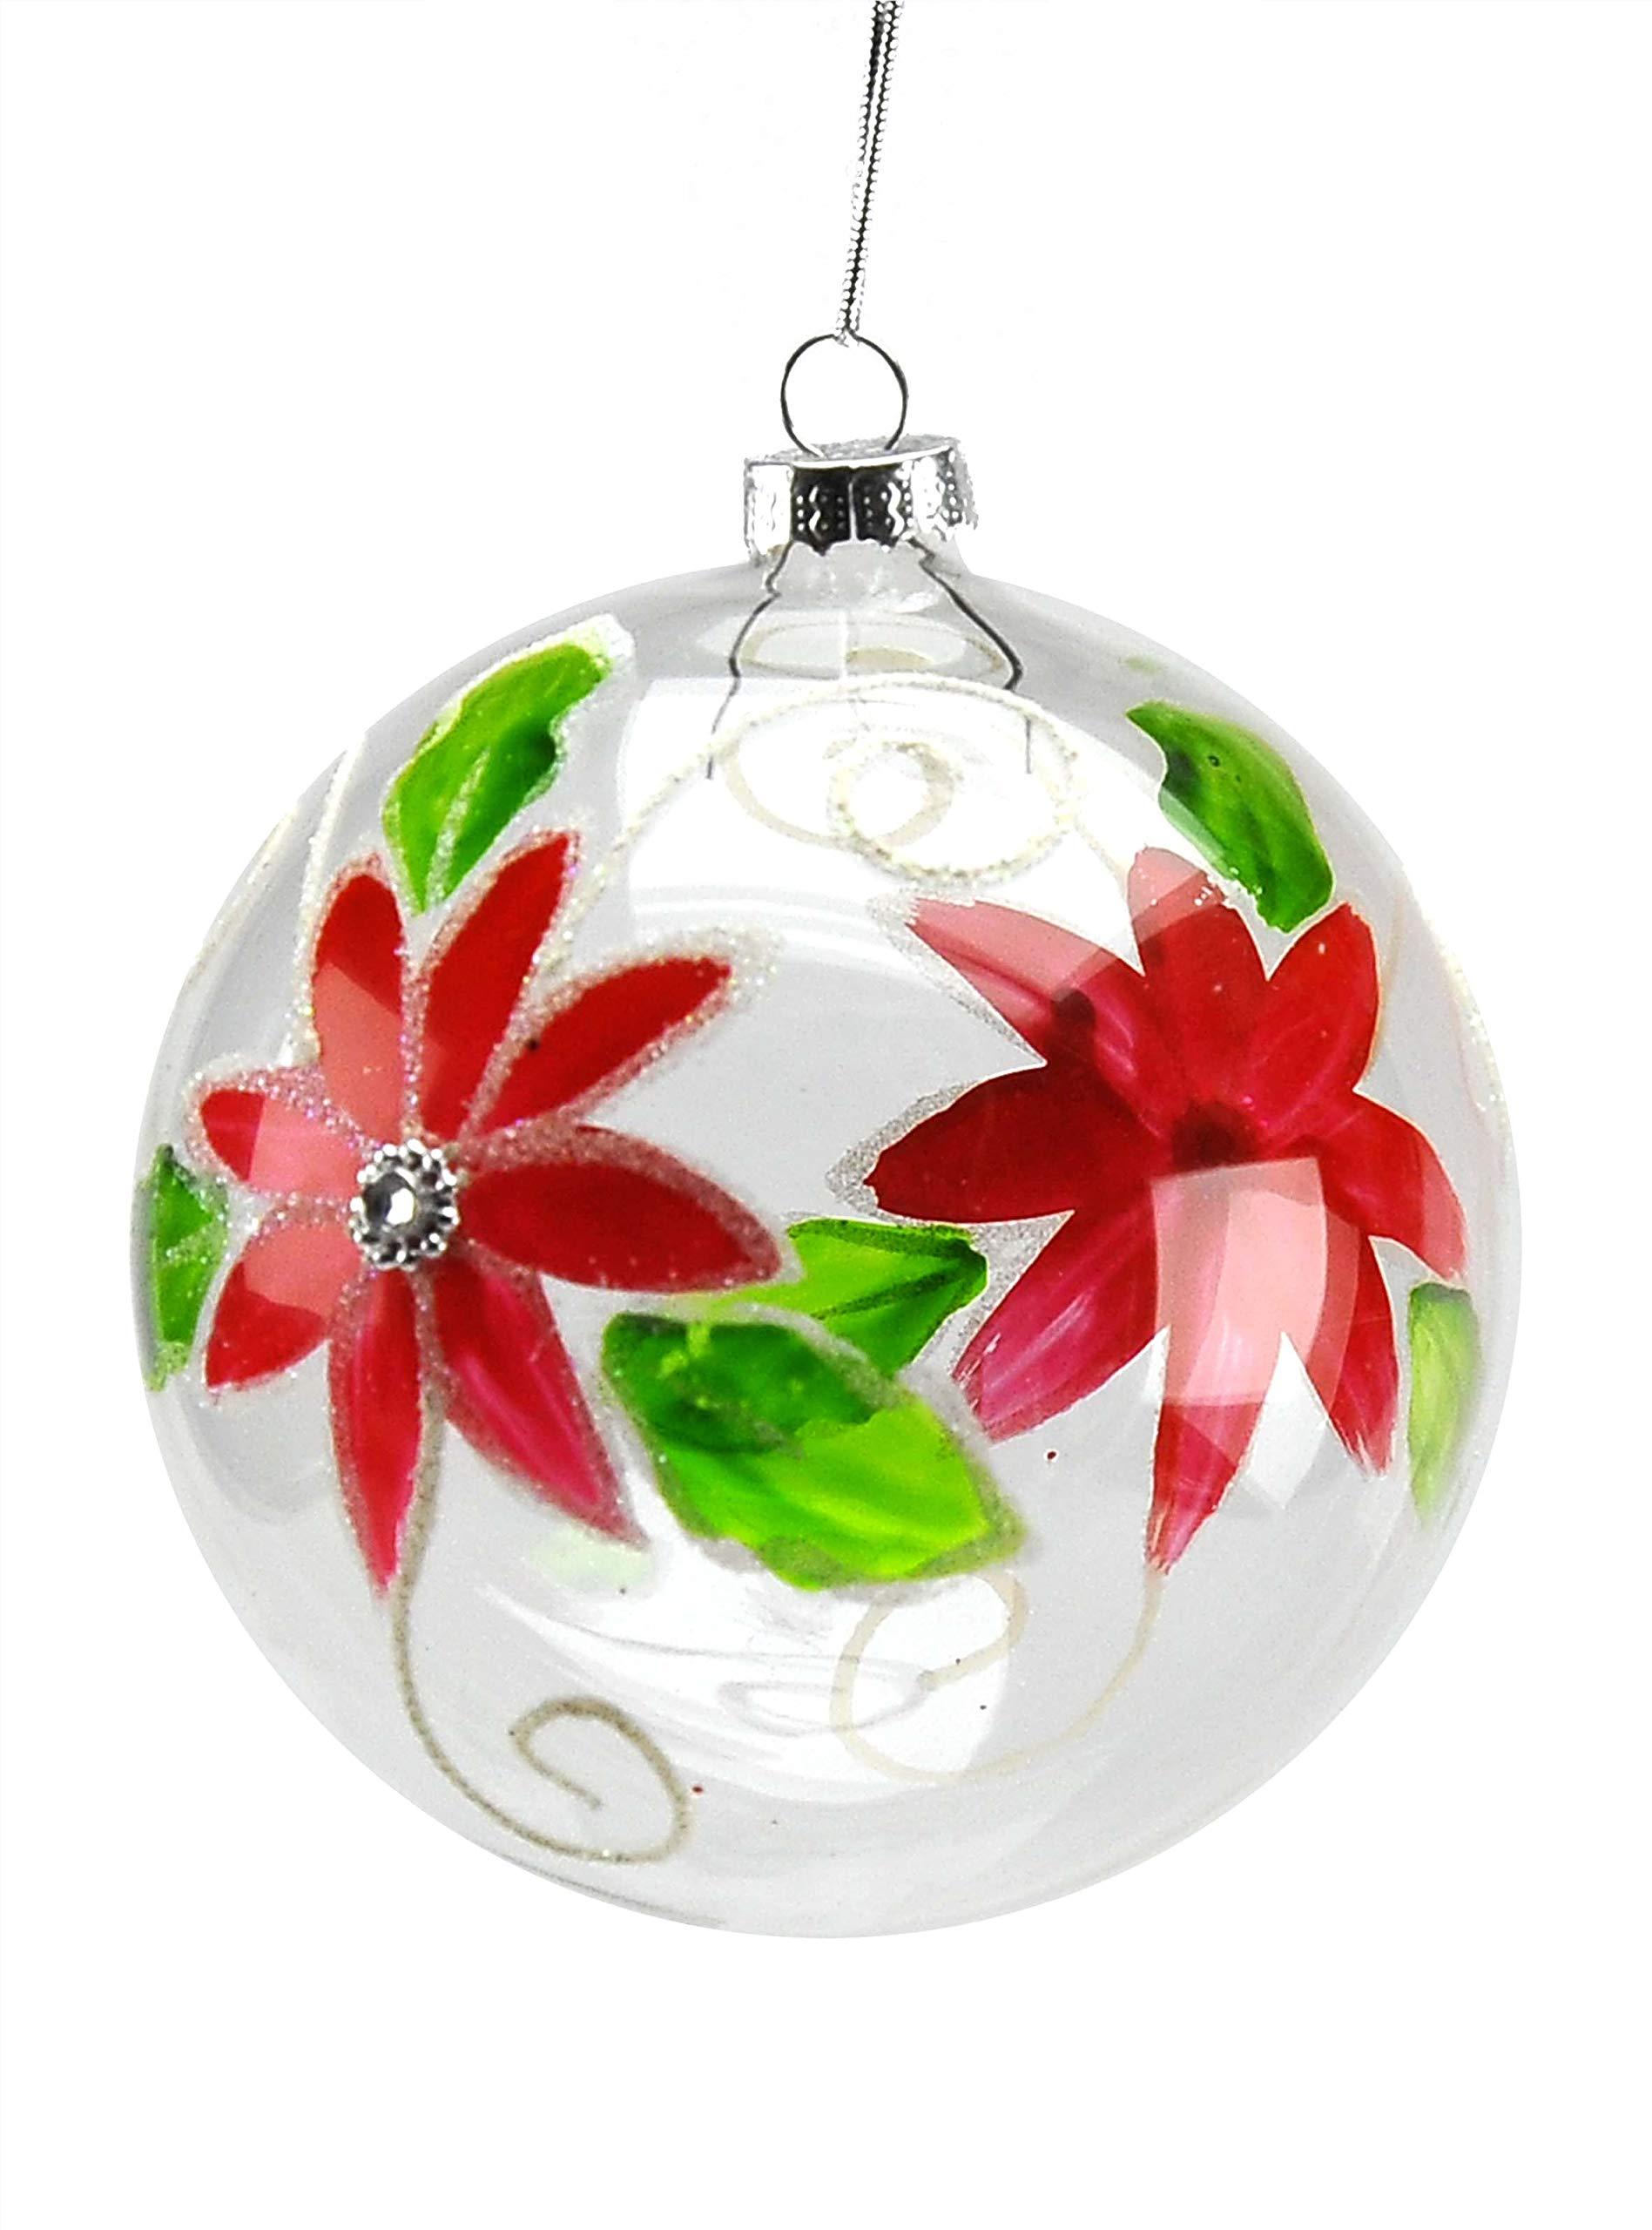 Widdop Regali Carino Babbo Natale in Lidded Palla di Neve Decorazione